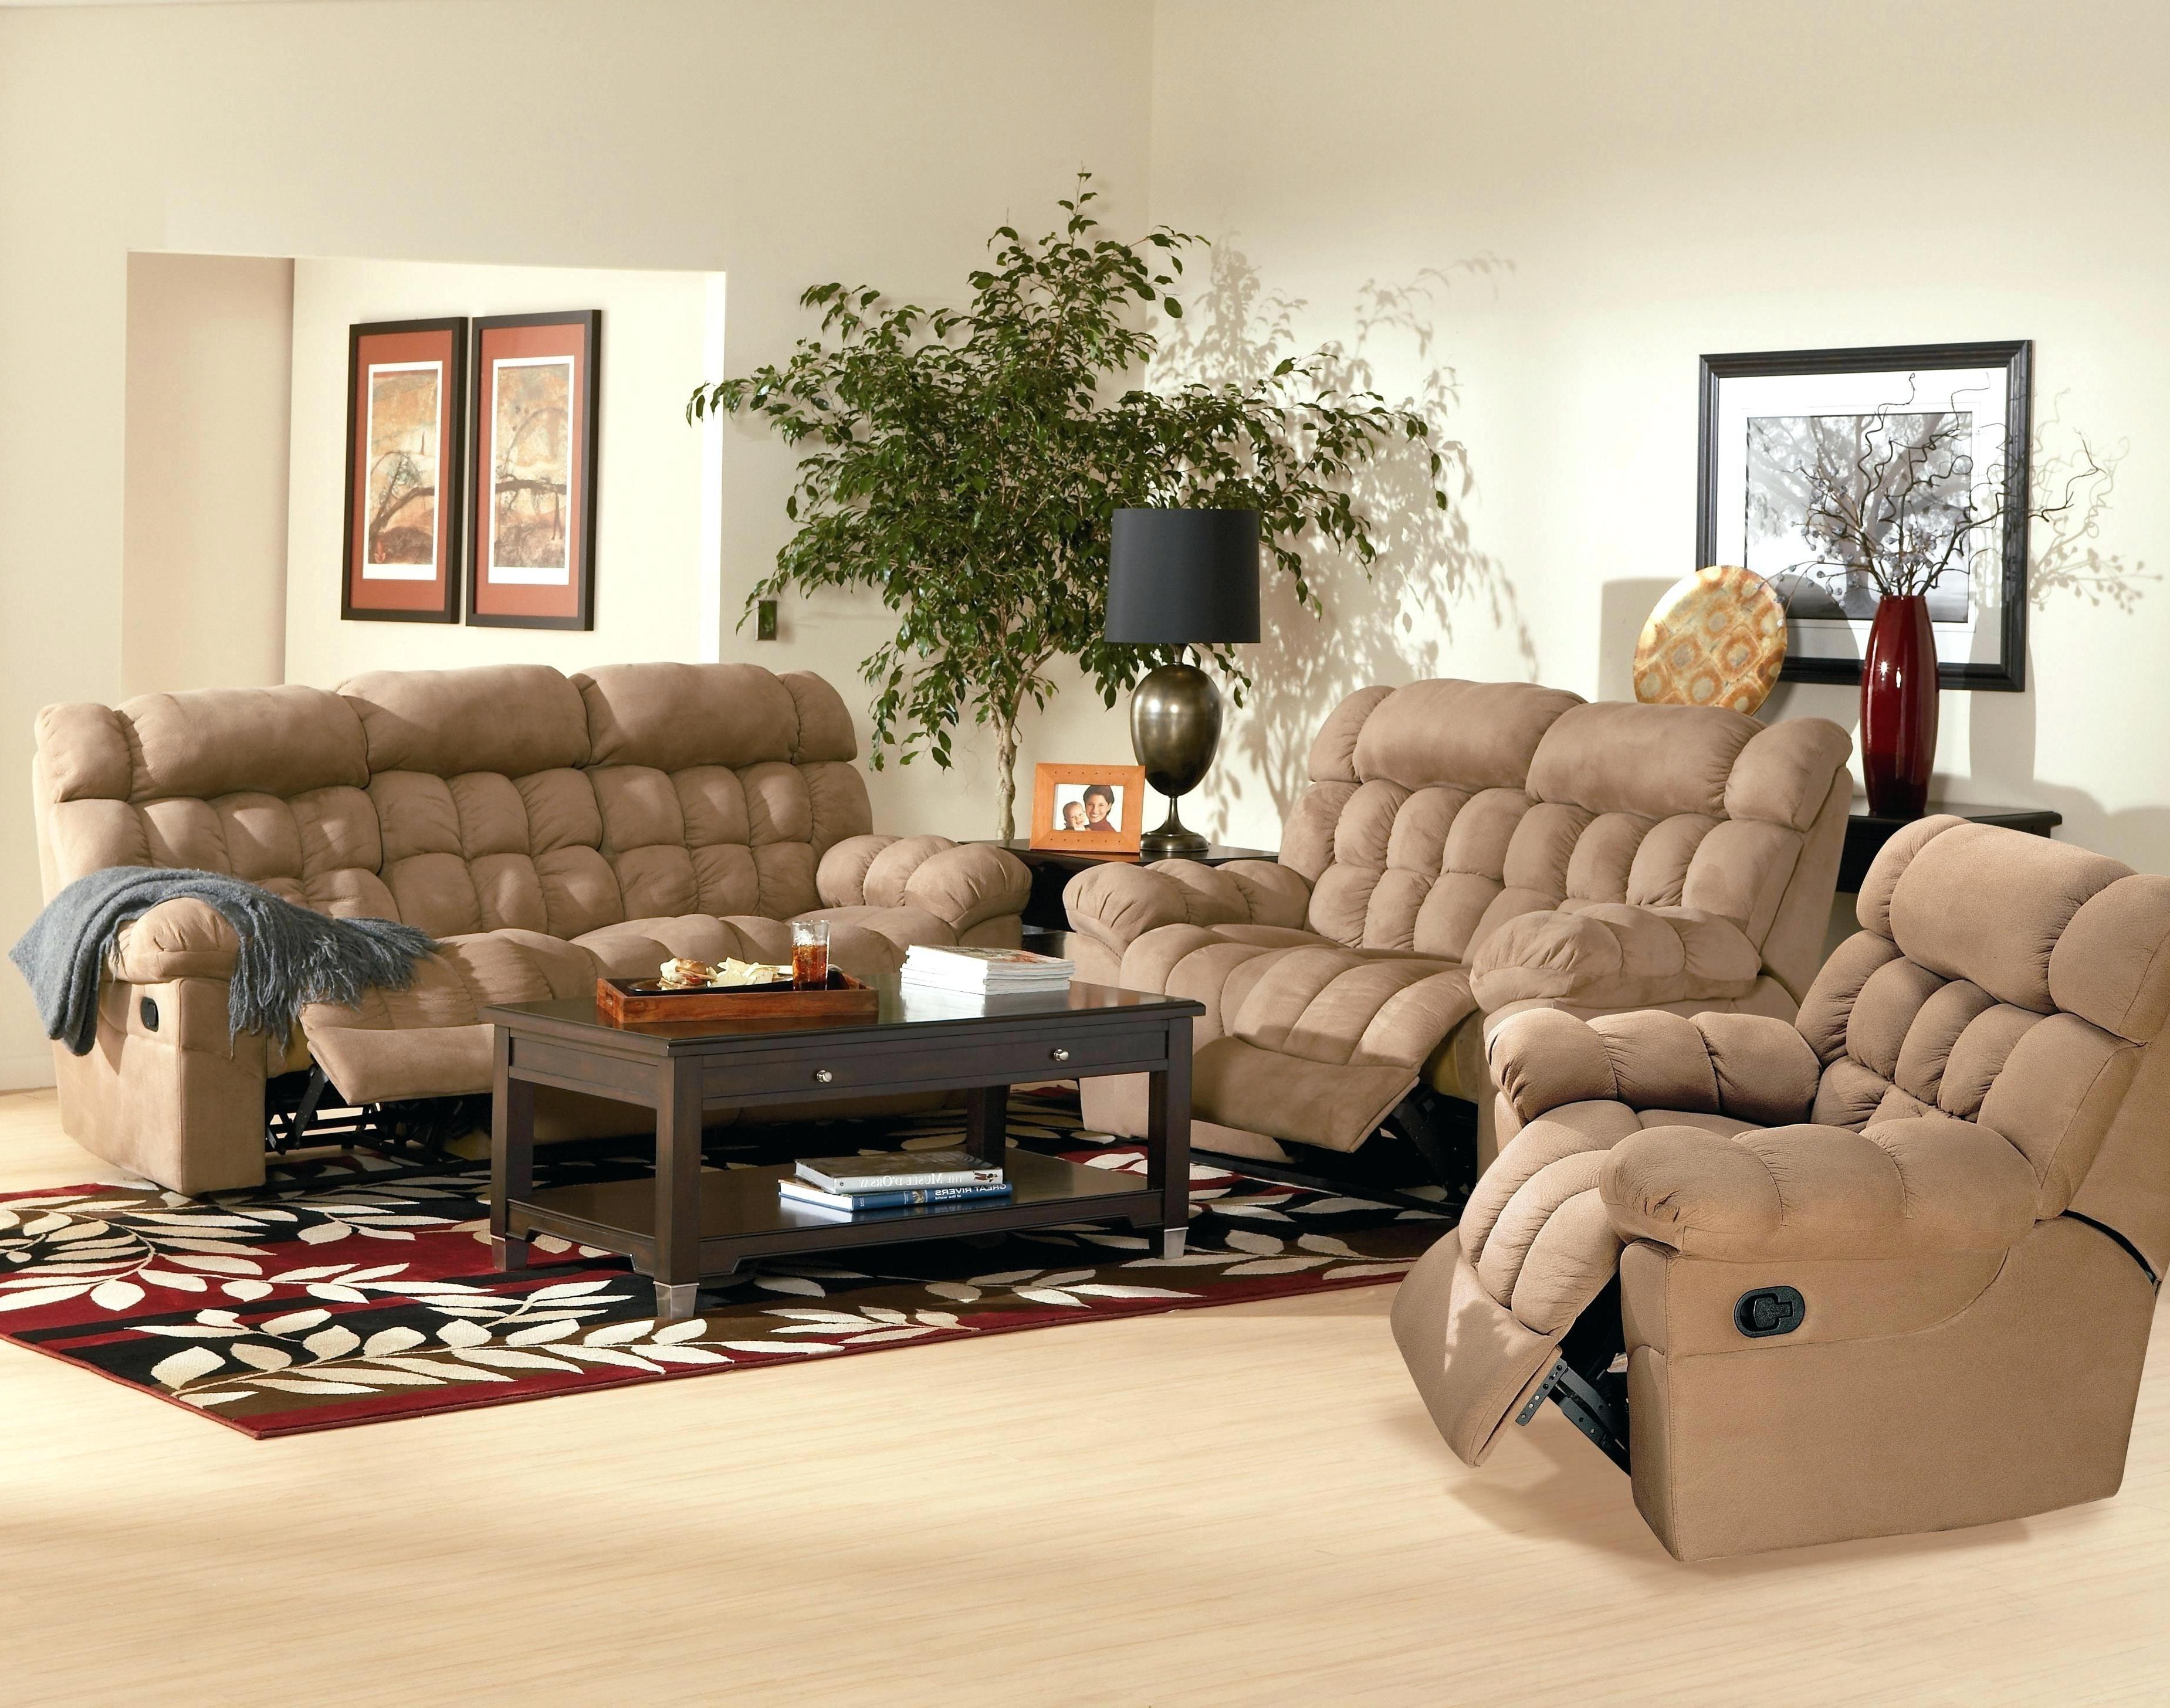 Overstuffed Sofas And Chairs With Regard To 2017 Overstuffed Sofa – Jasonatavastrealty (View 6 of 15)